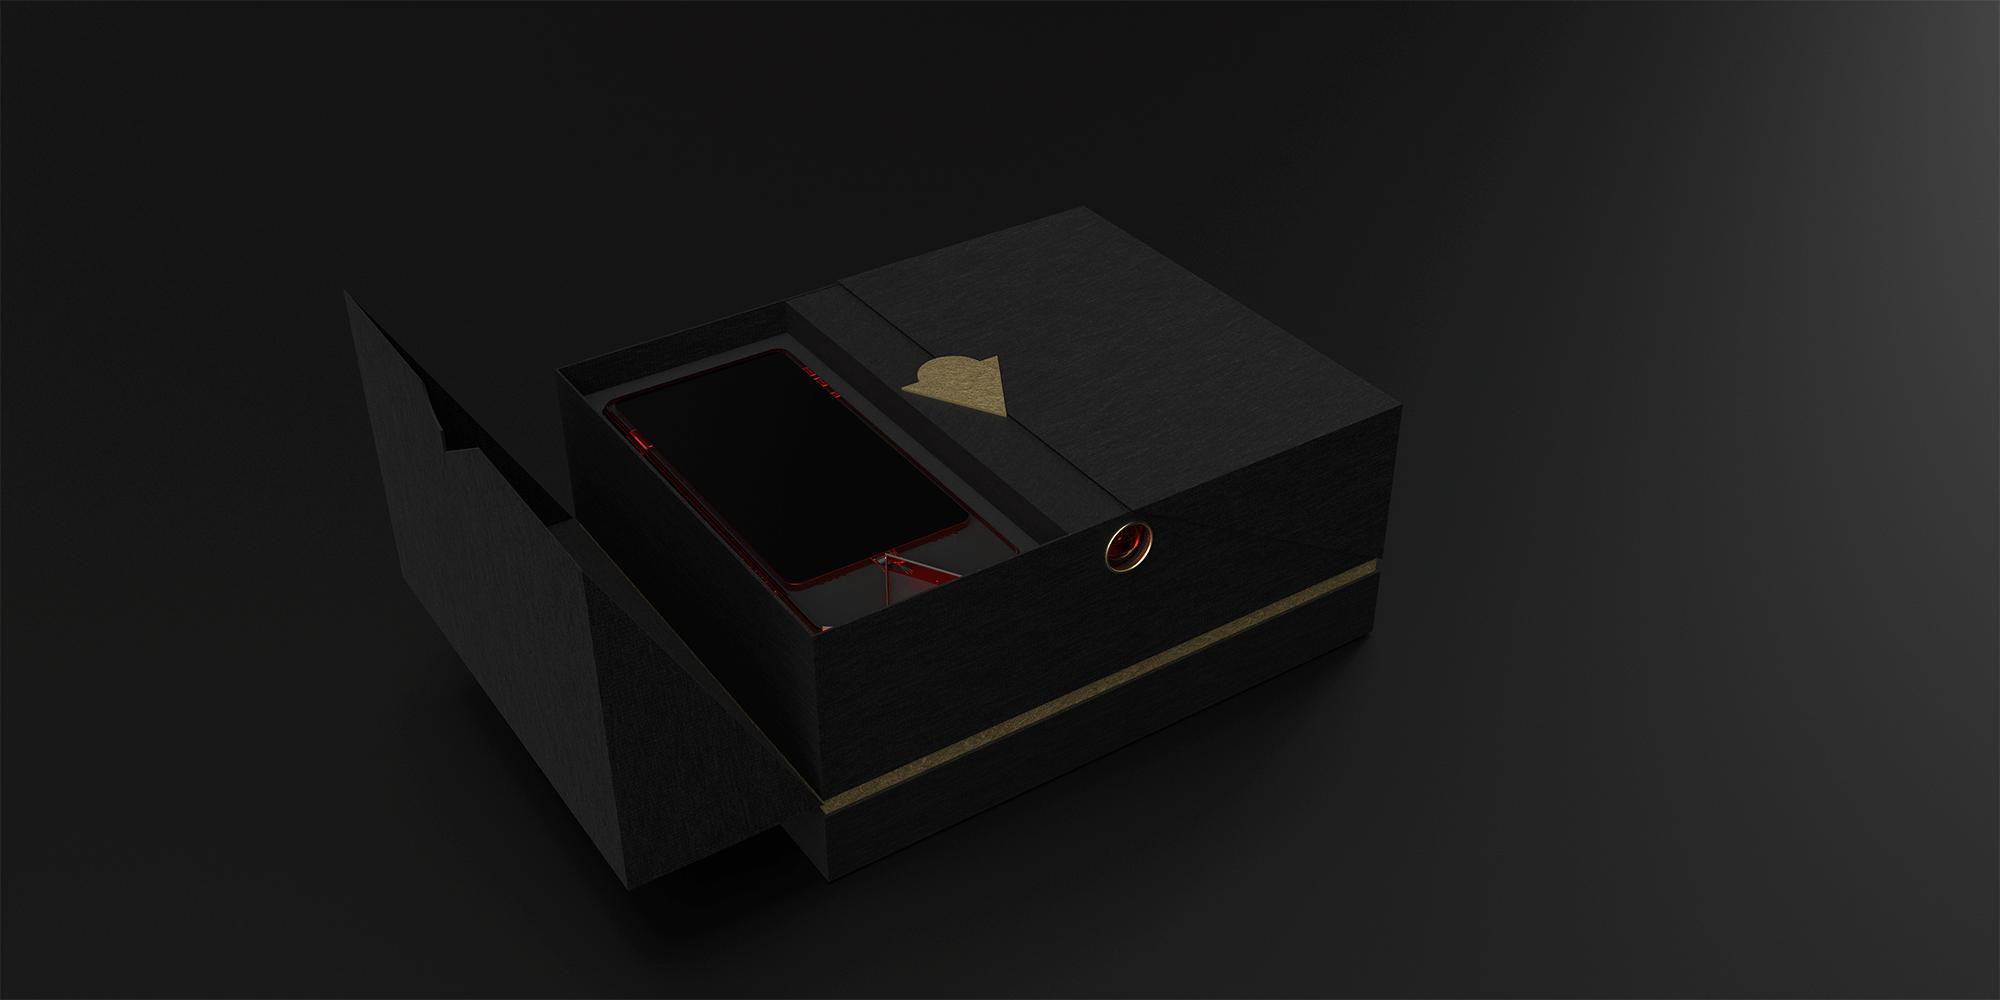 Box content